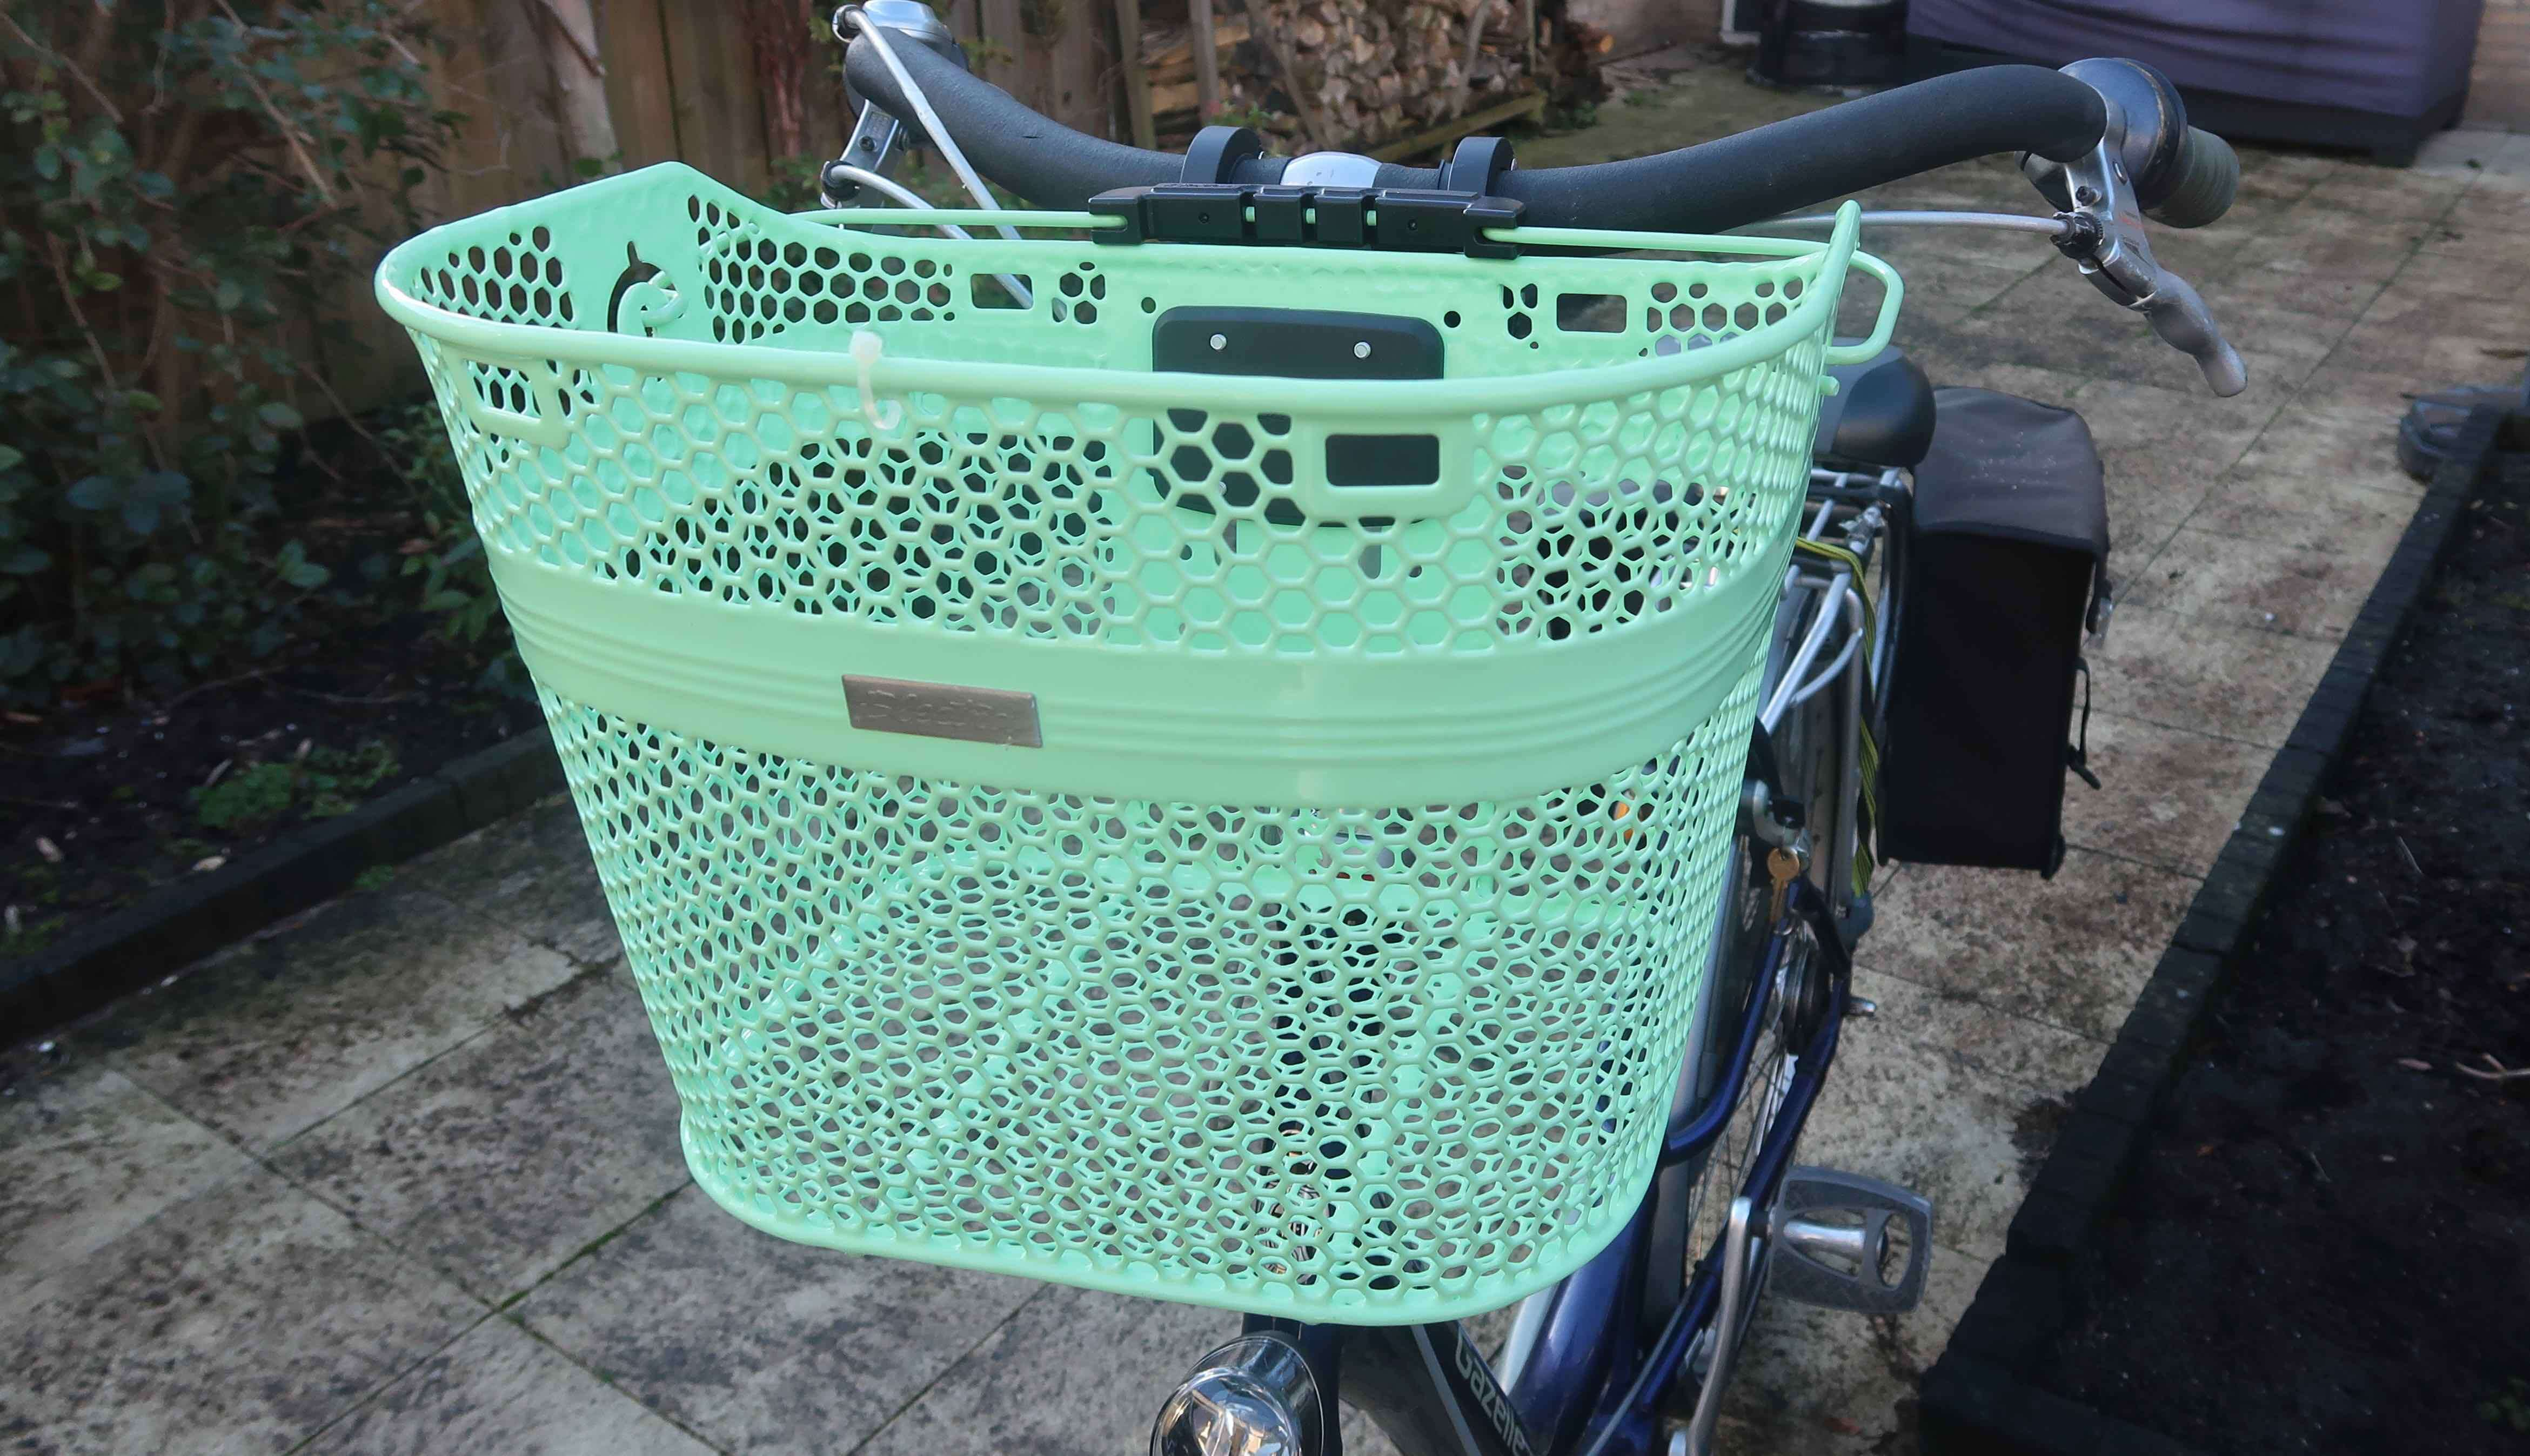 fiets gebruiksgemak